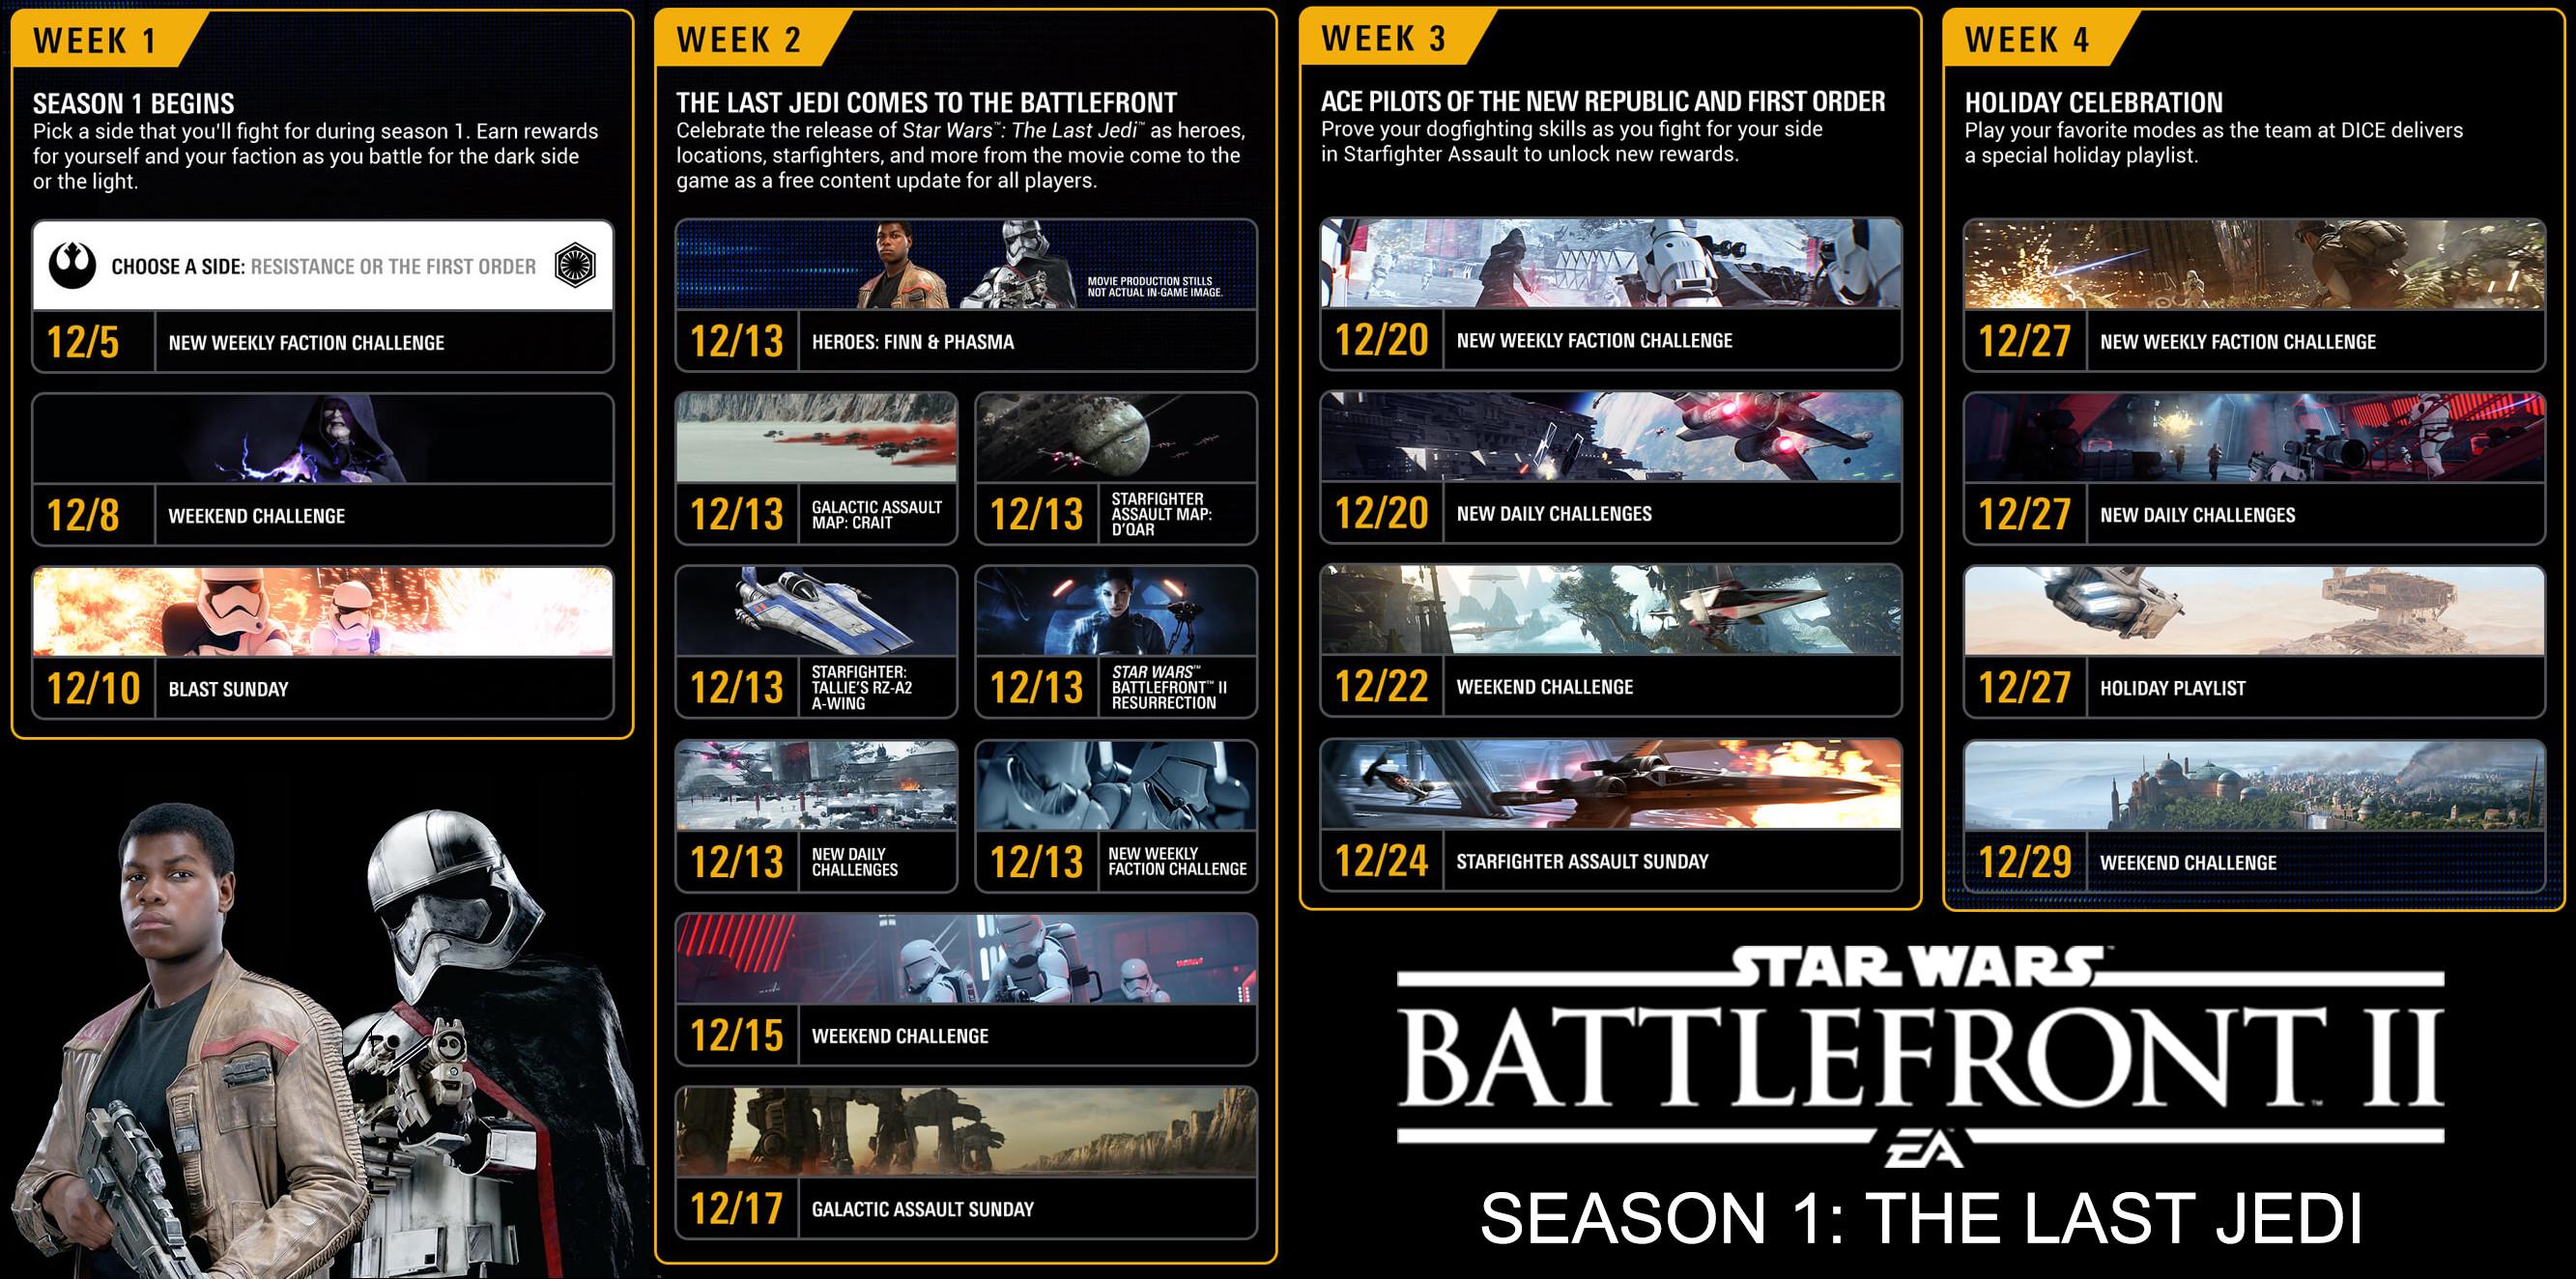 Star Wars Battlefront 2 Season 1: The Last Jedi